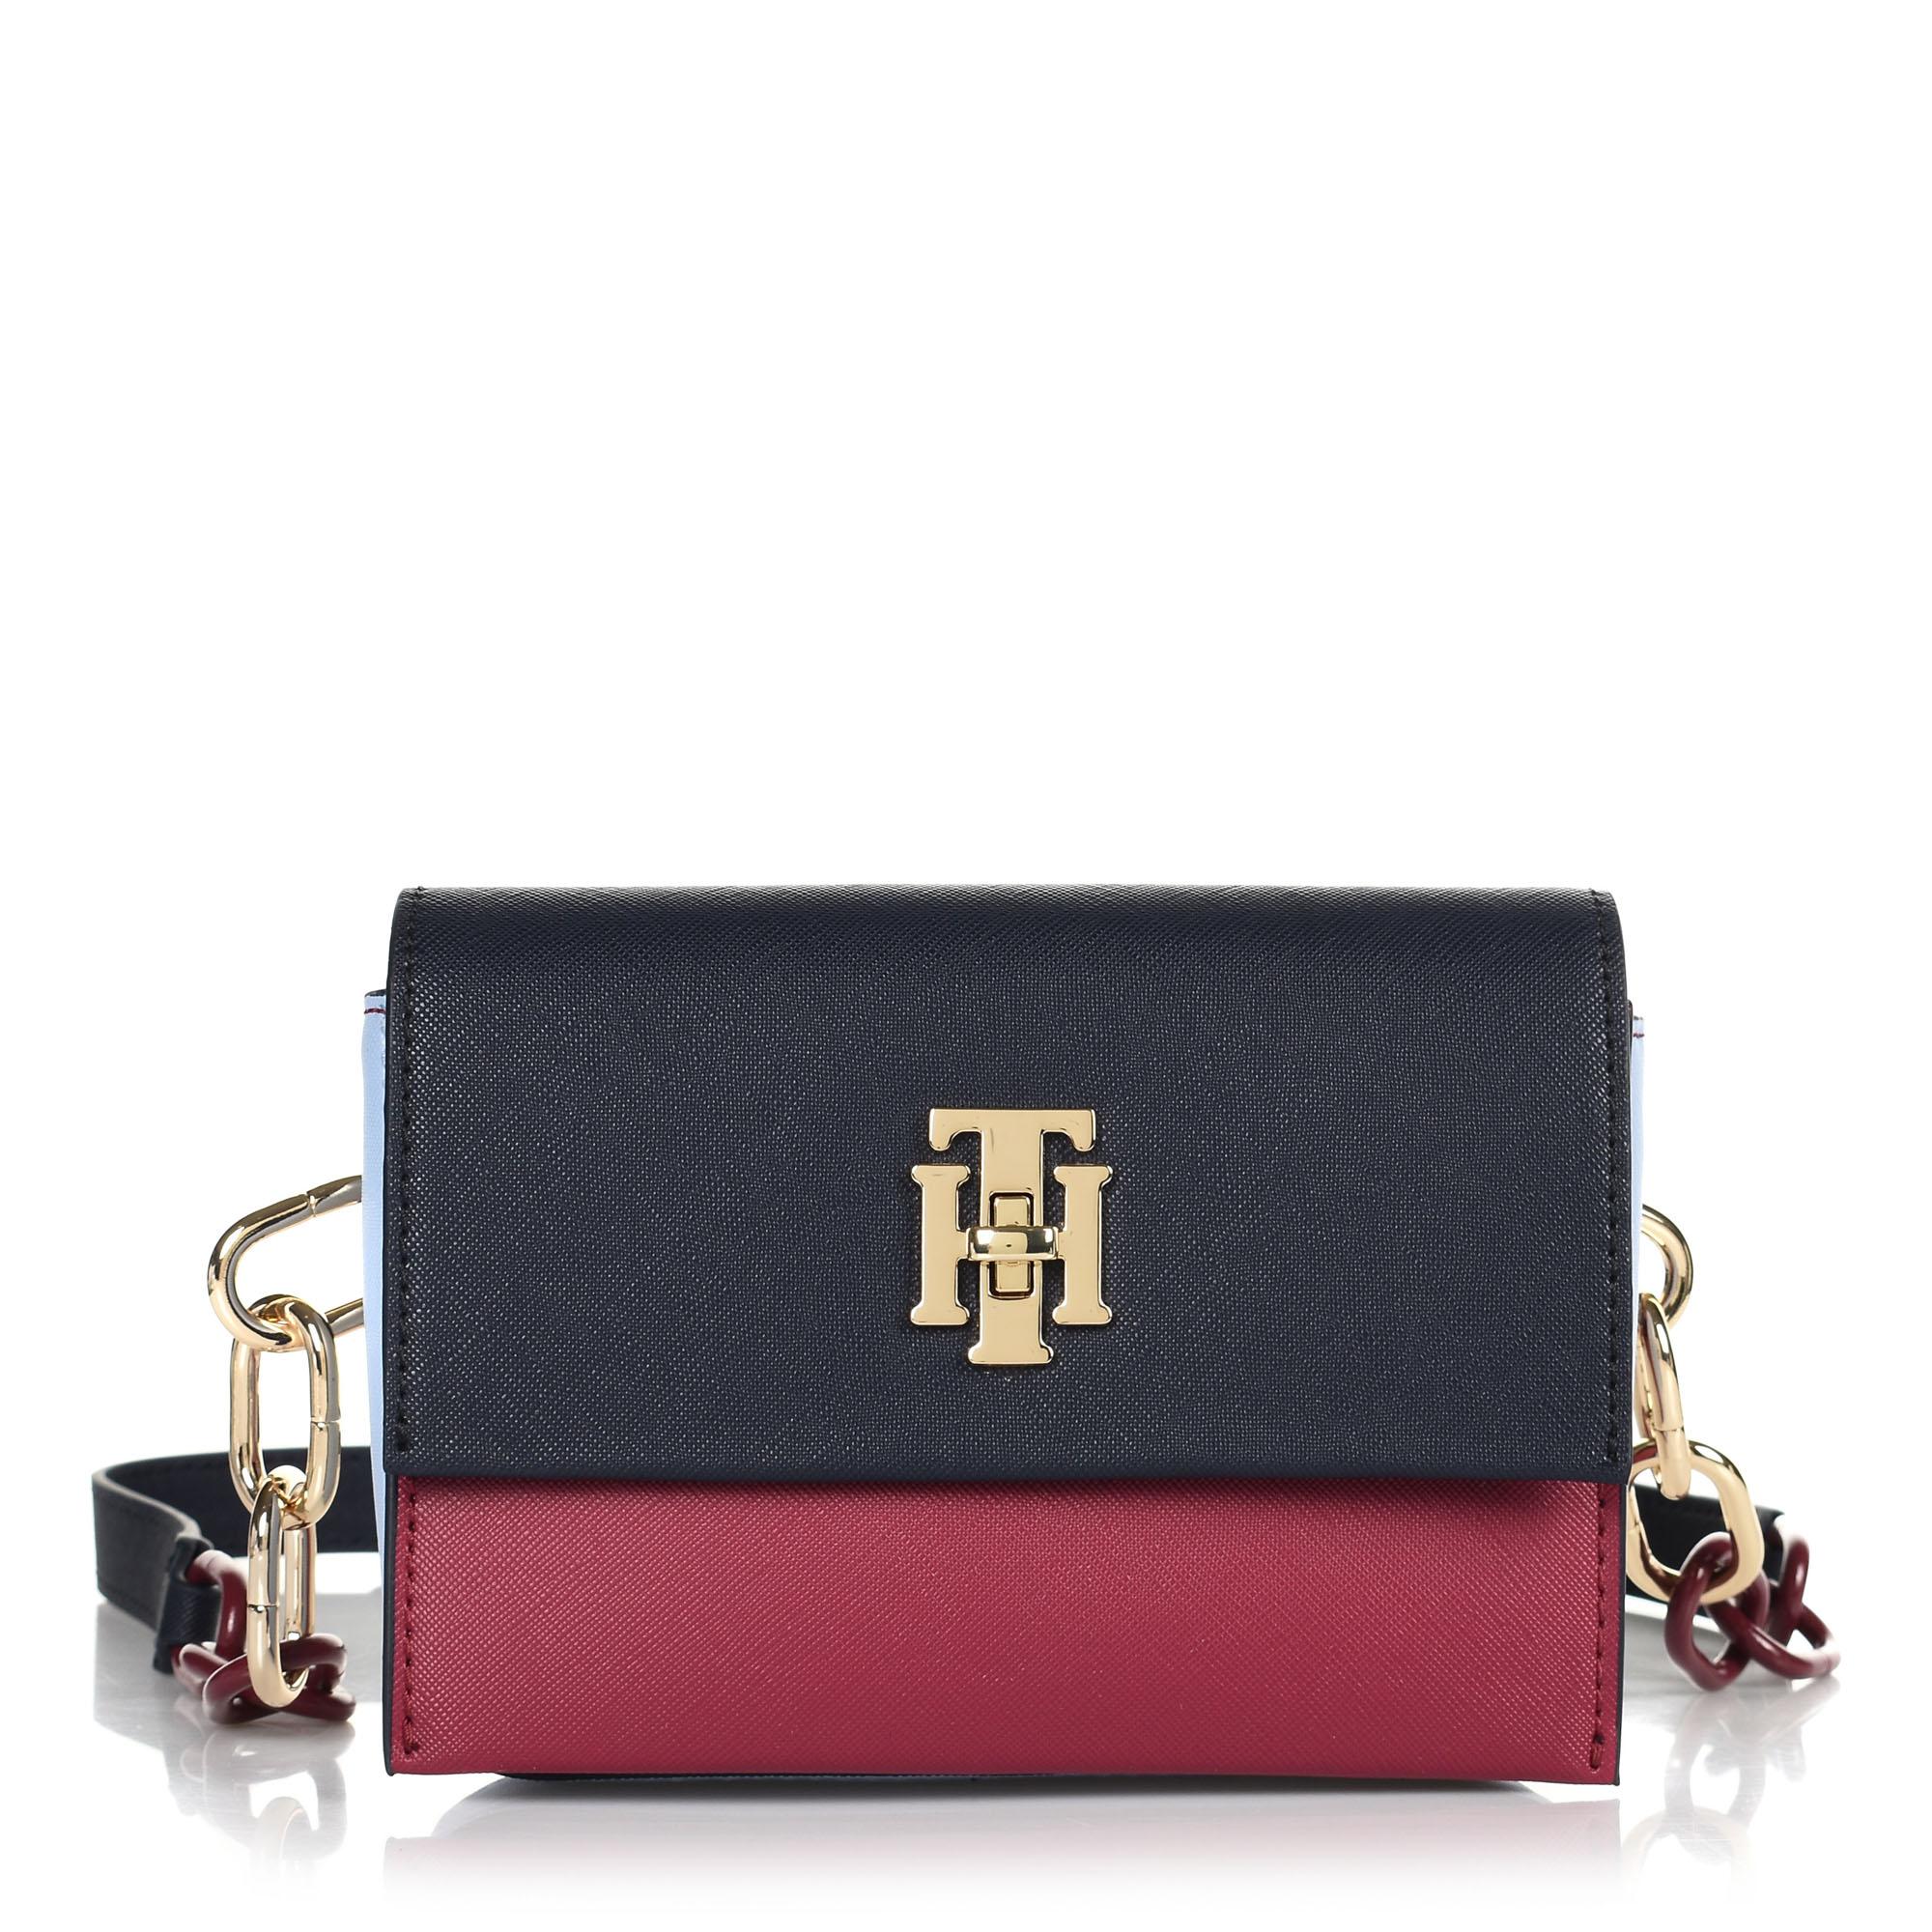 46af835475 Brand Bags Τσαντάκι Μέσης Tommy Hilfiger AW0AW06908 TH Saffiano